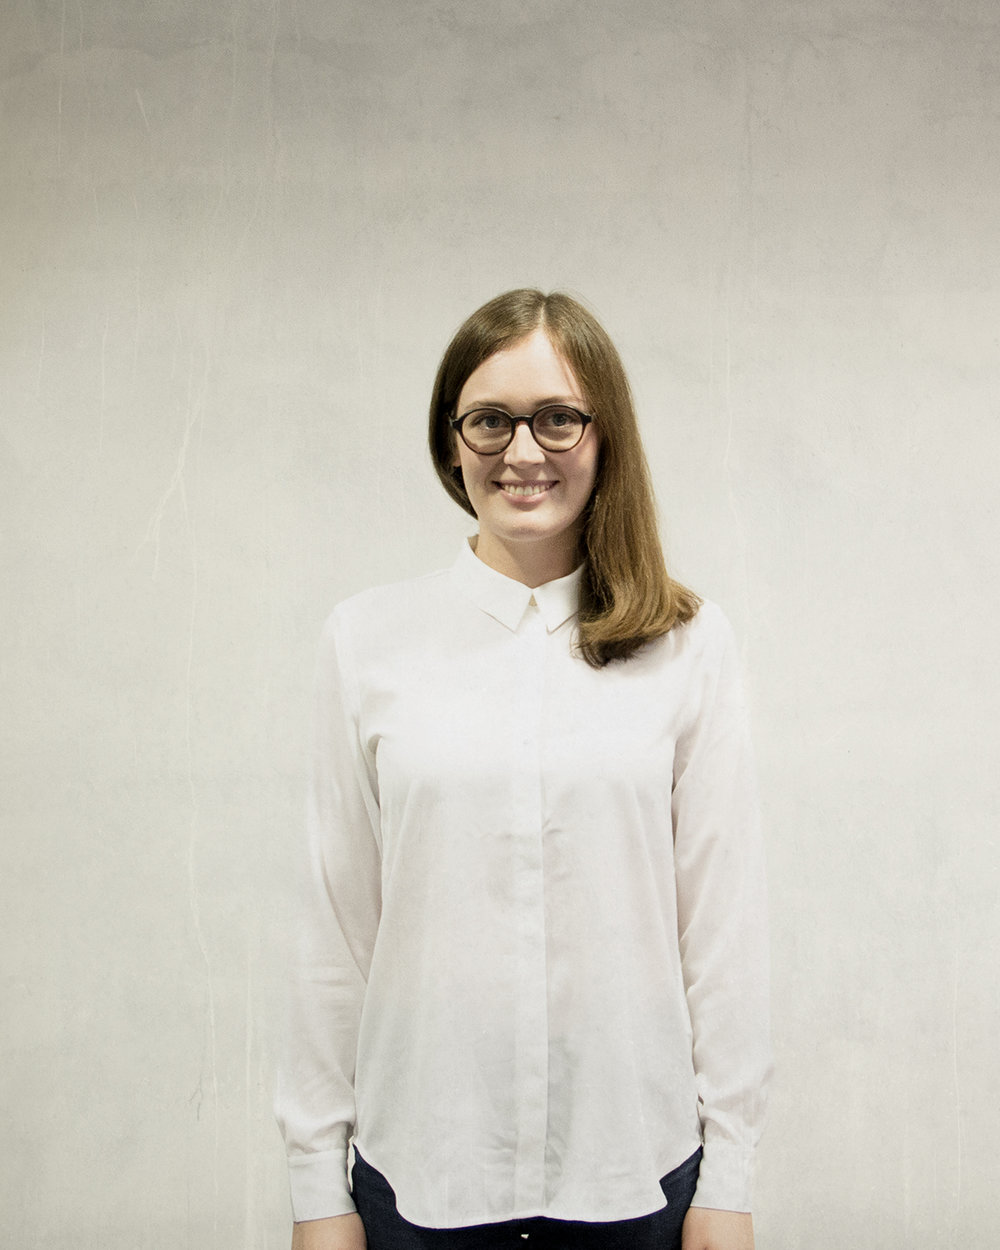 JOHANNA ZECHMEISTER  Product Manager  T: +43 1 318 55 22-250 F: +43 1 318 55 22-900 E:  johanna.zechmeister@multigate.at